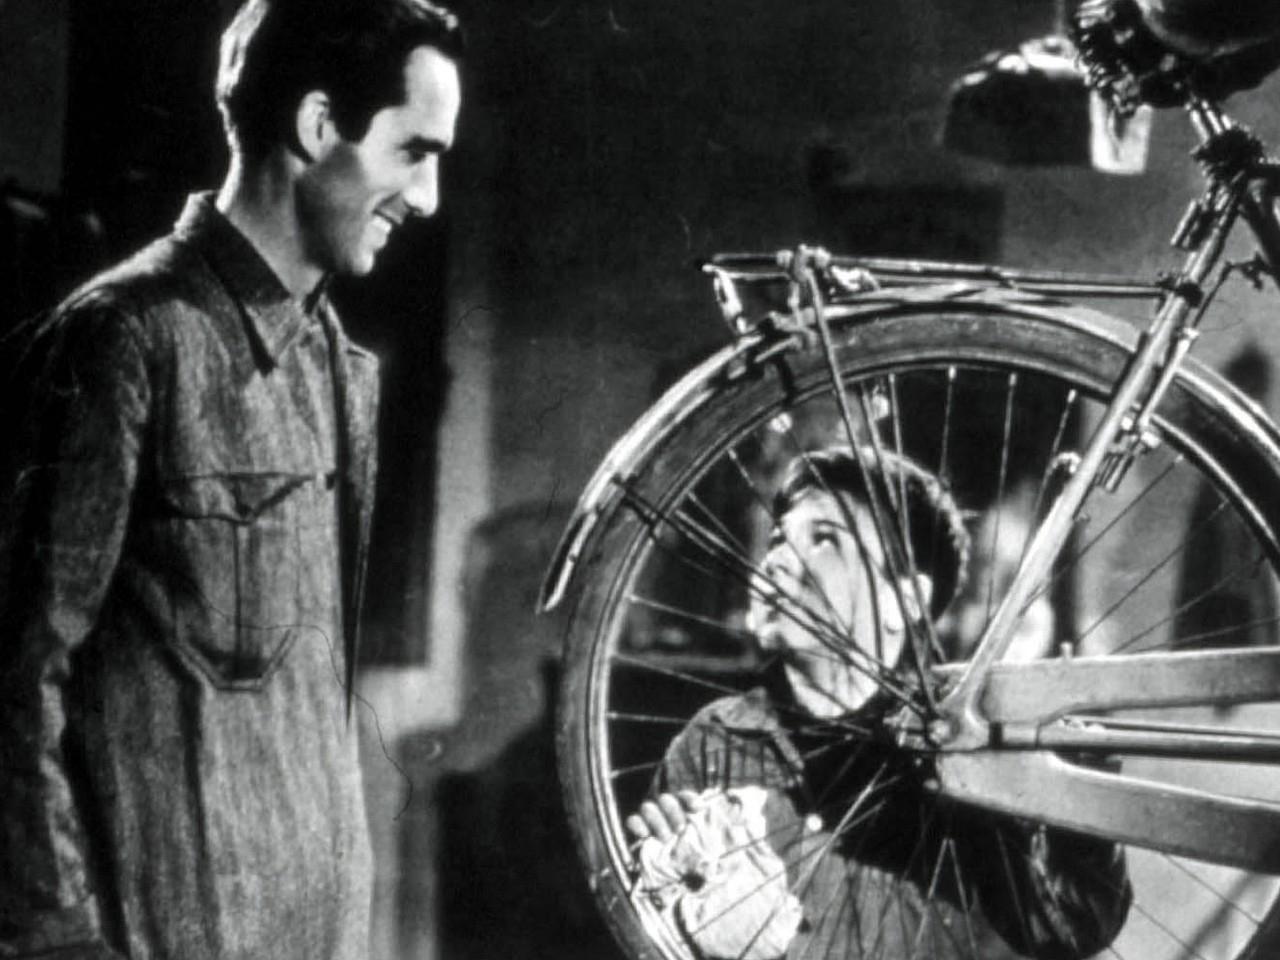 Ladro_n-de-bicicletas